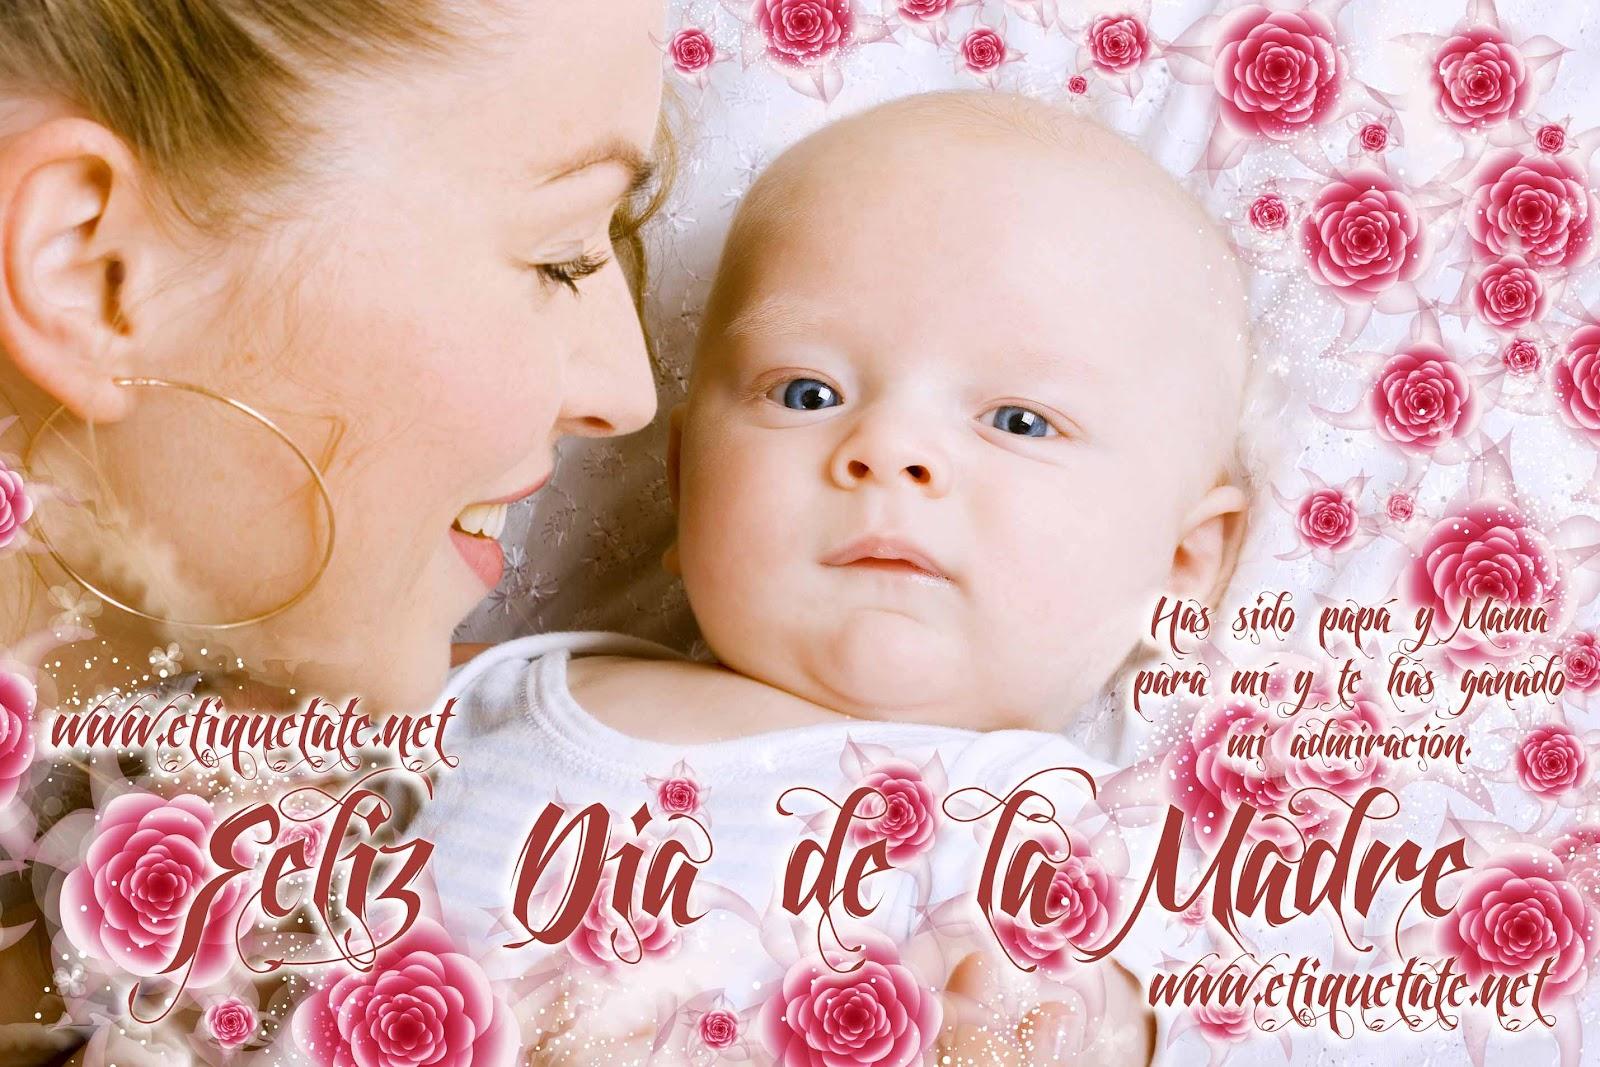 Imagenes dia de la madre - Cosas para el dia de la madre ...